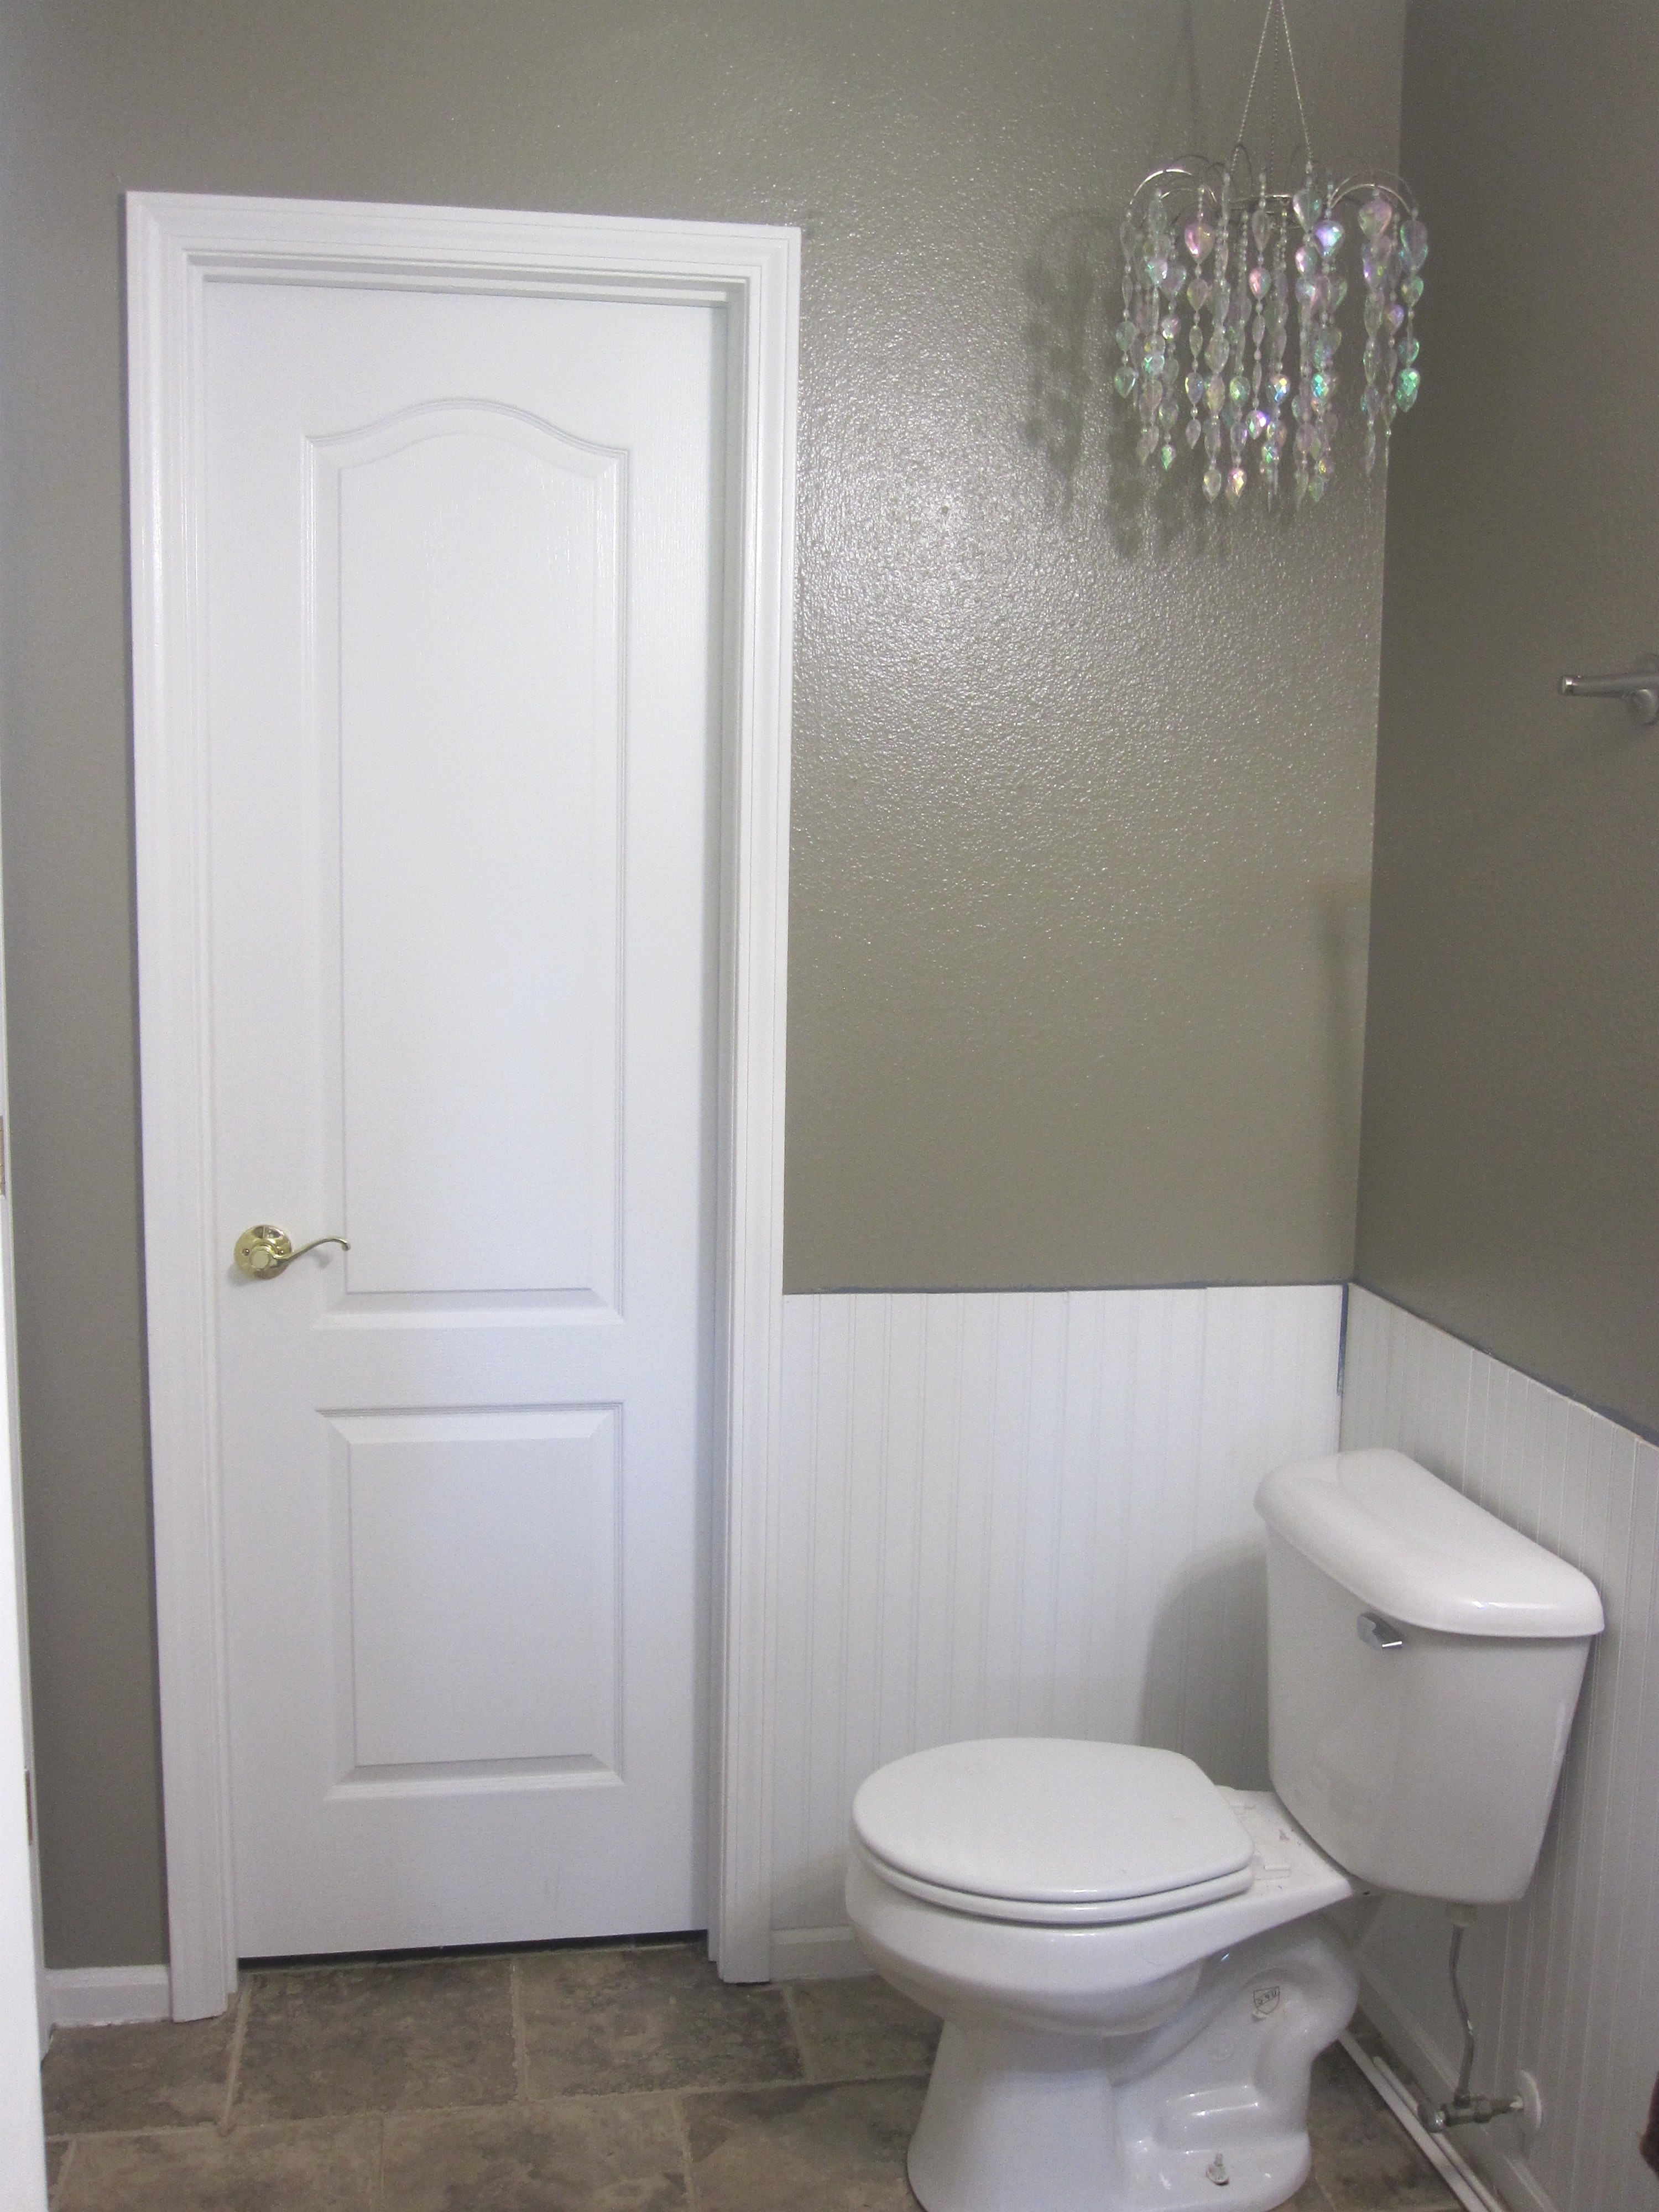 2019 Uncategorized : Mini Chandelier For Bathroom Inside Glorious For Mini Chandelier Bathroom Lighting (View 2 of 20)